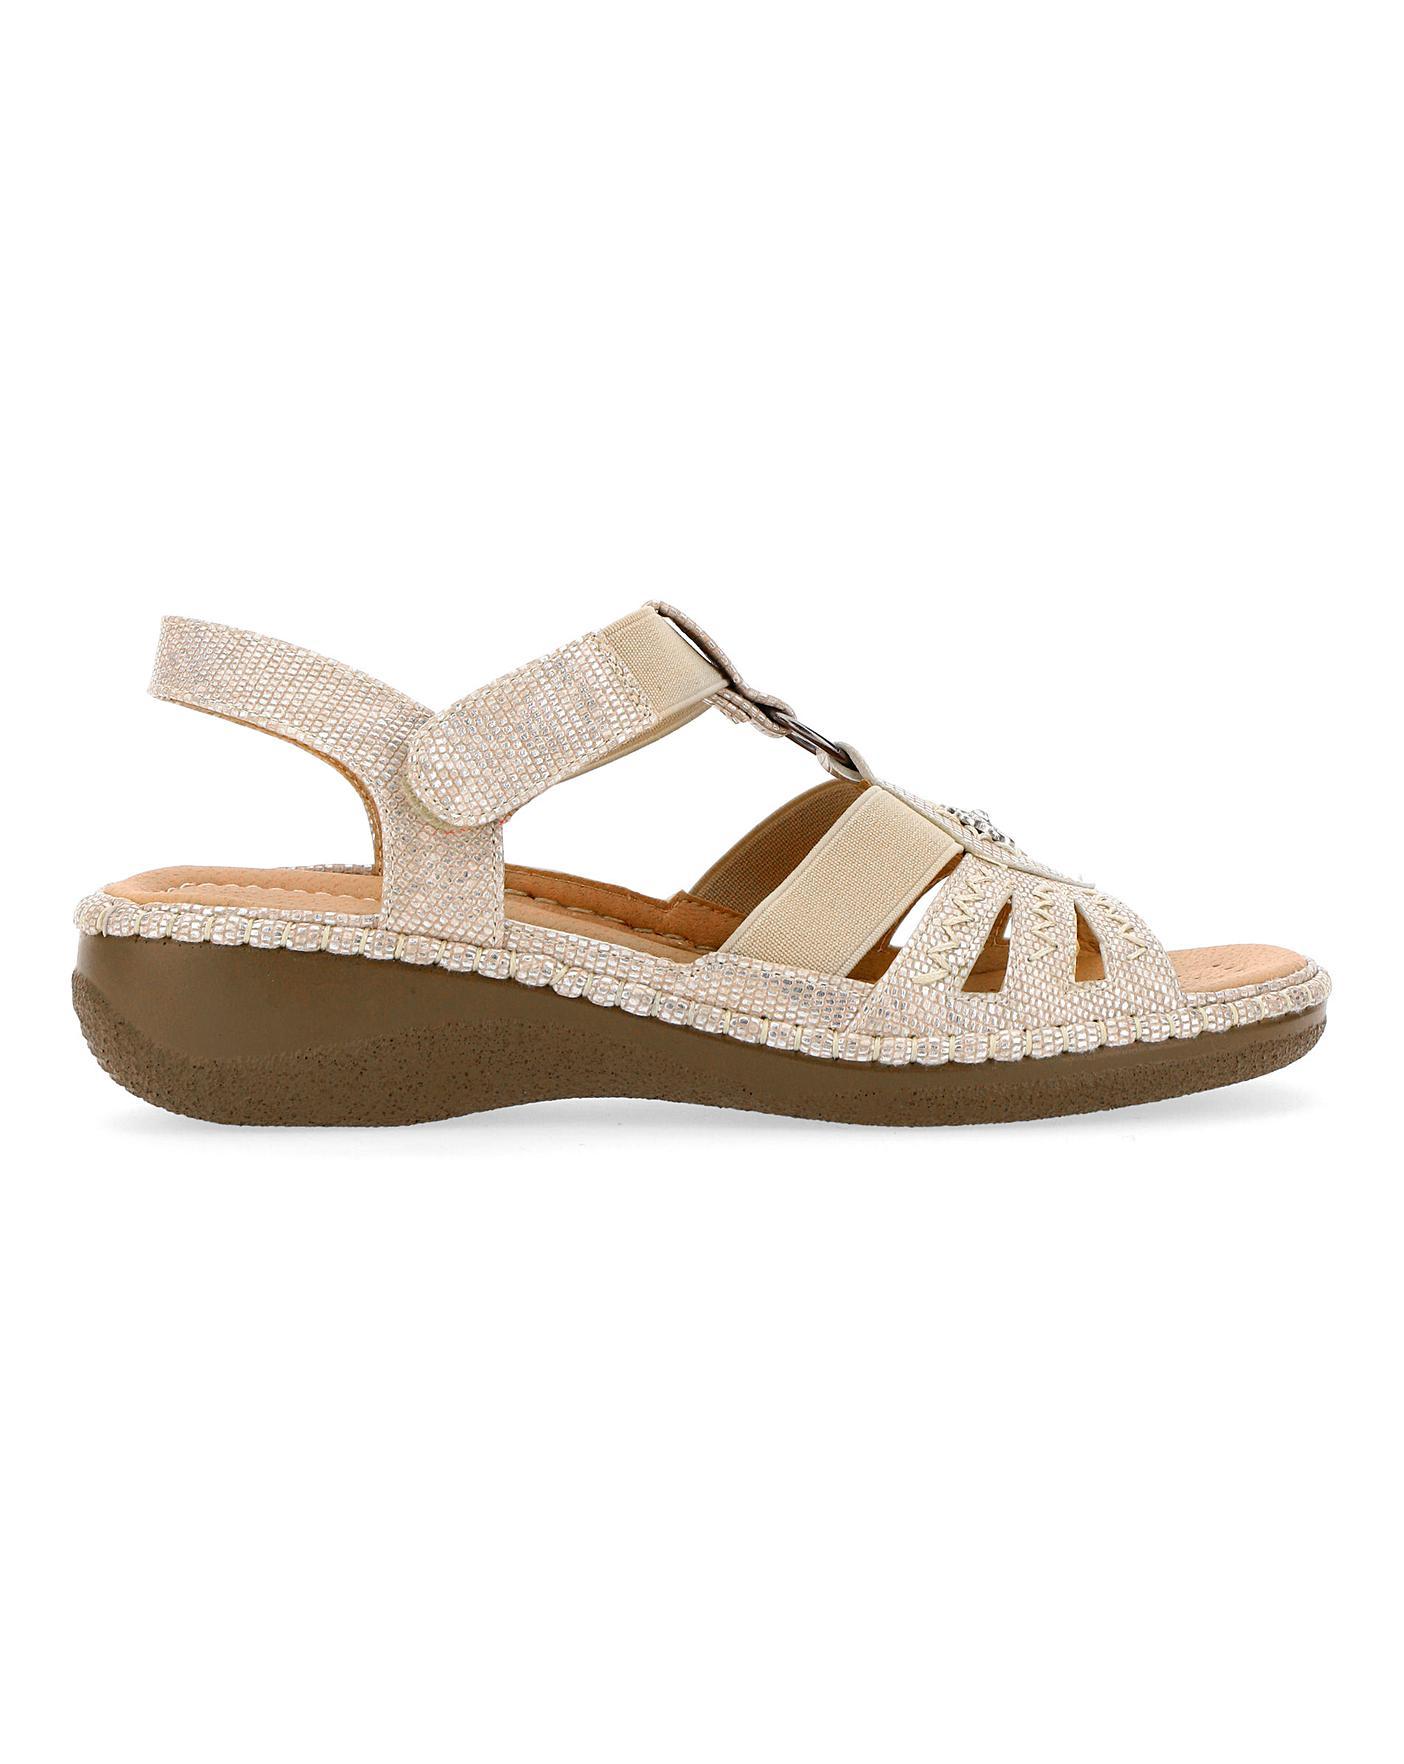 Cushion Walk Strappy Sandals E Fit   J